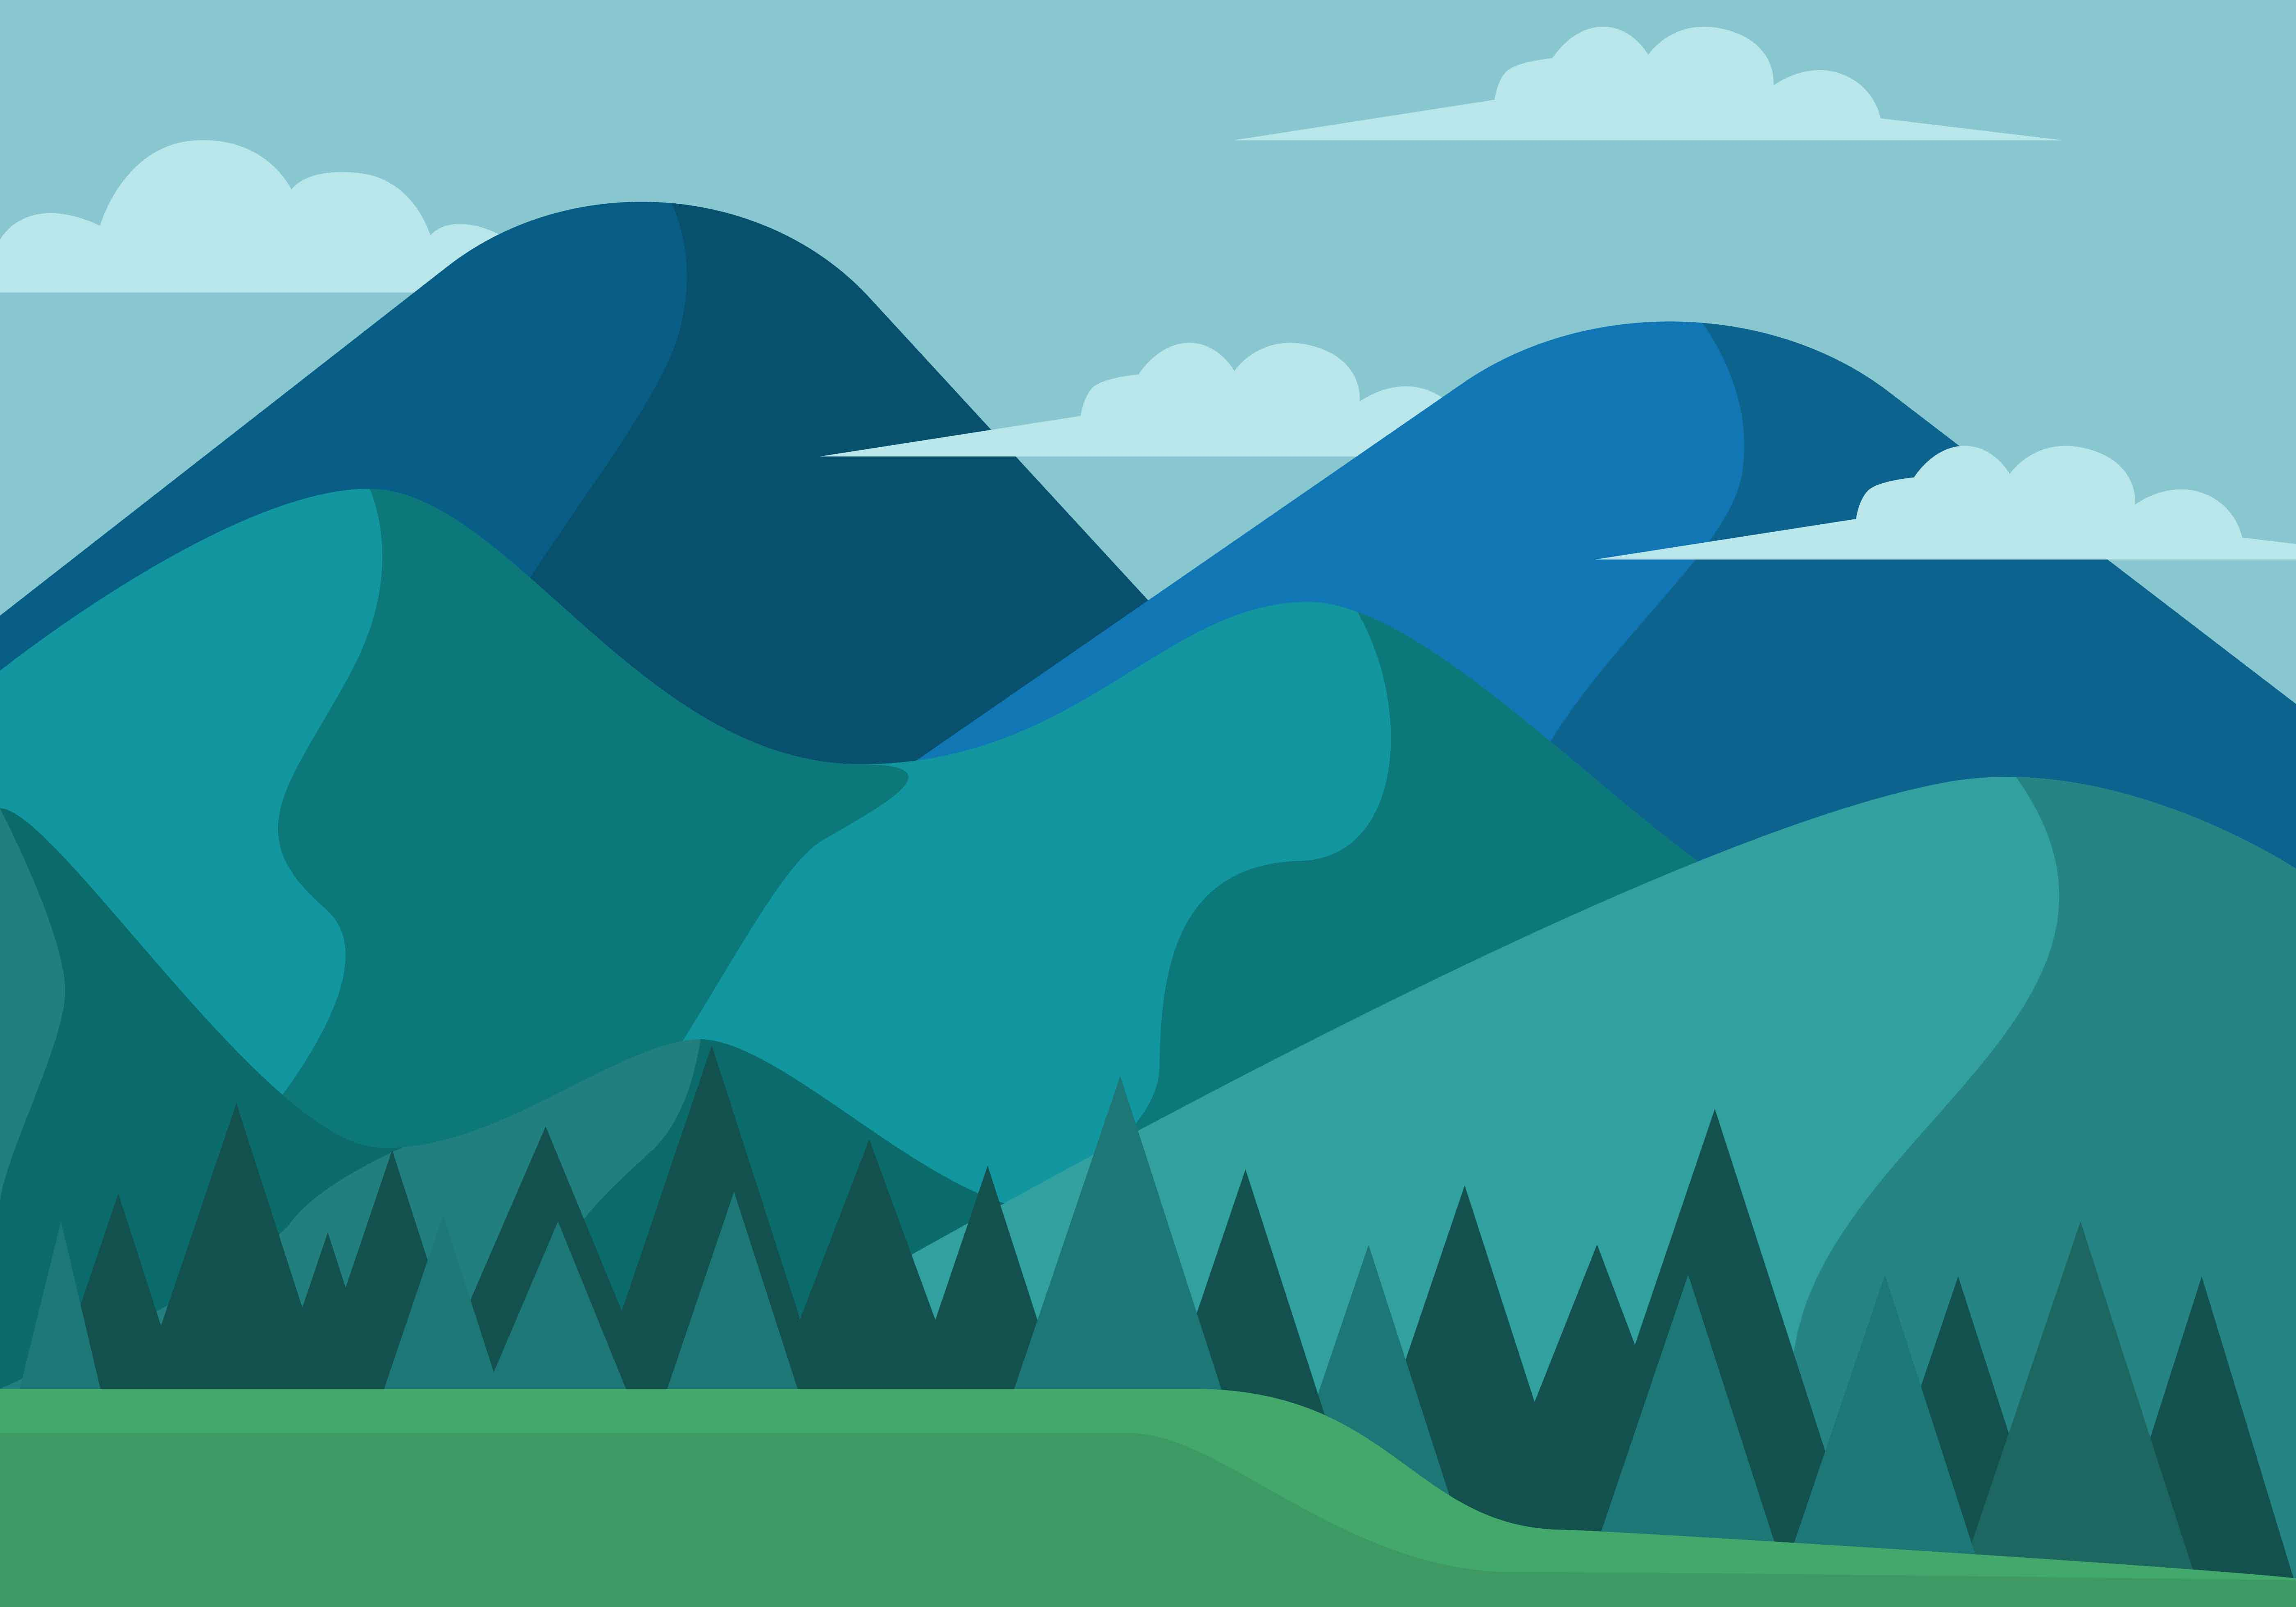 Landscape Illustration Vector Free: Mountain Landscape First Person Vector Illustration